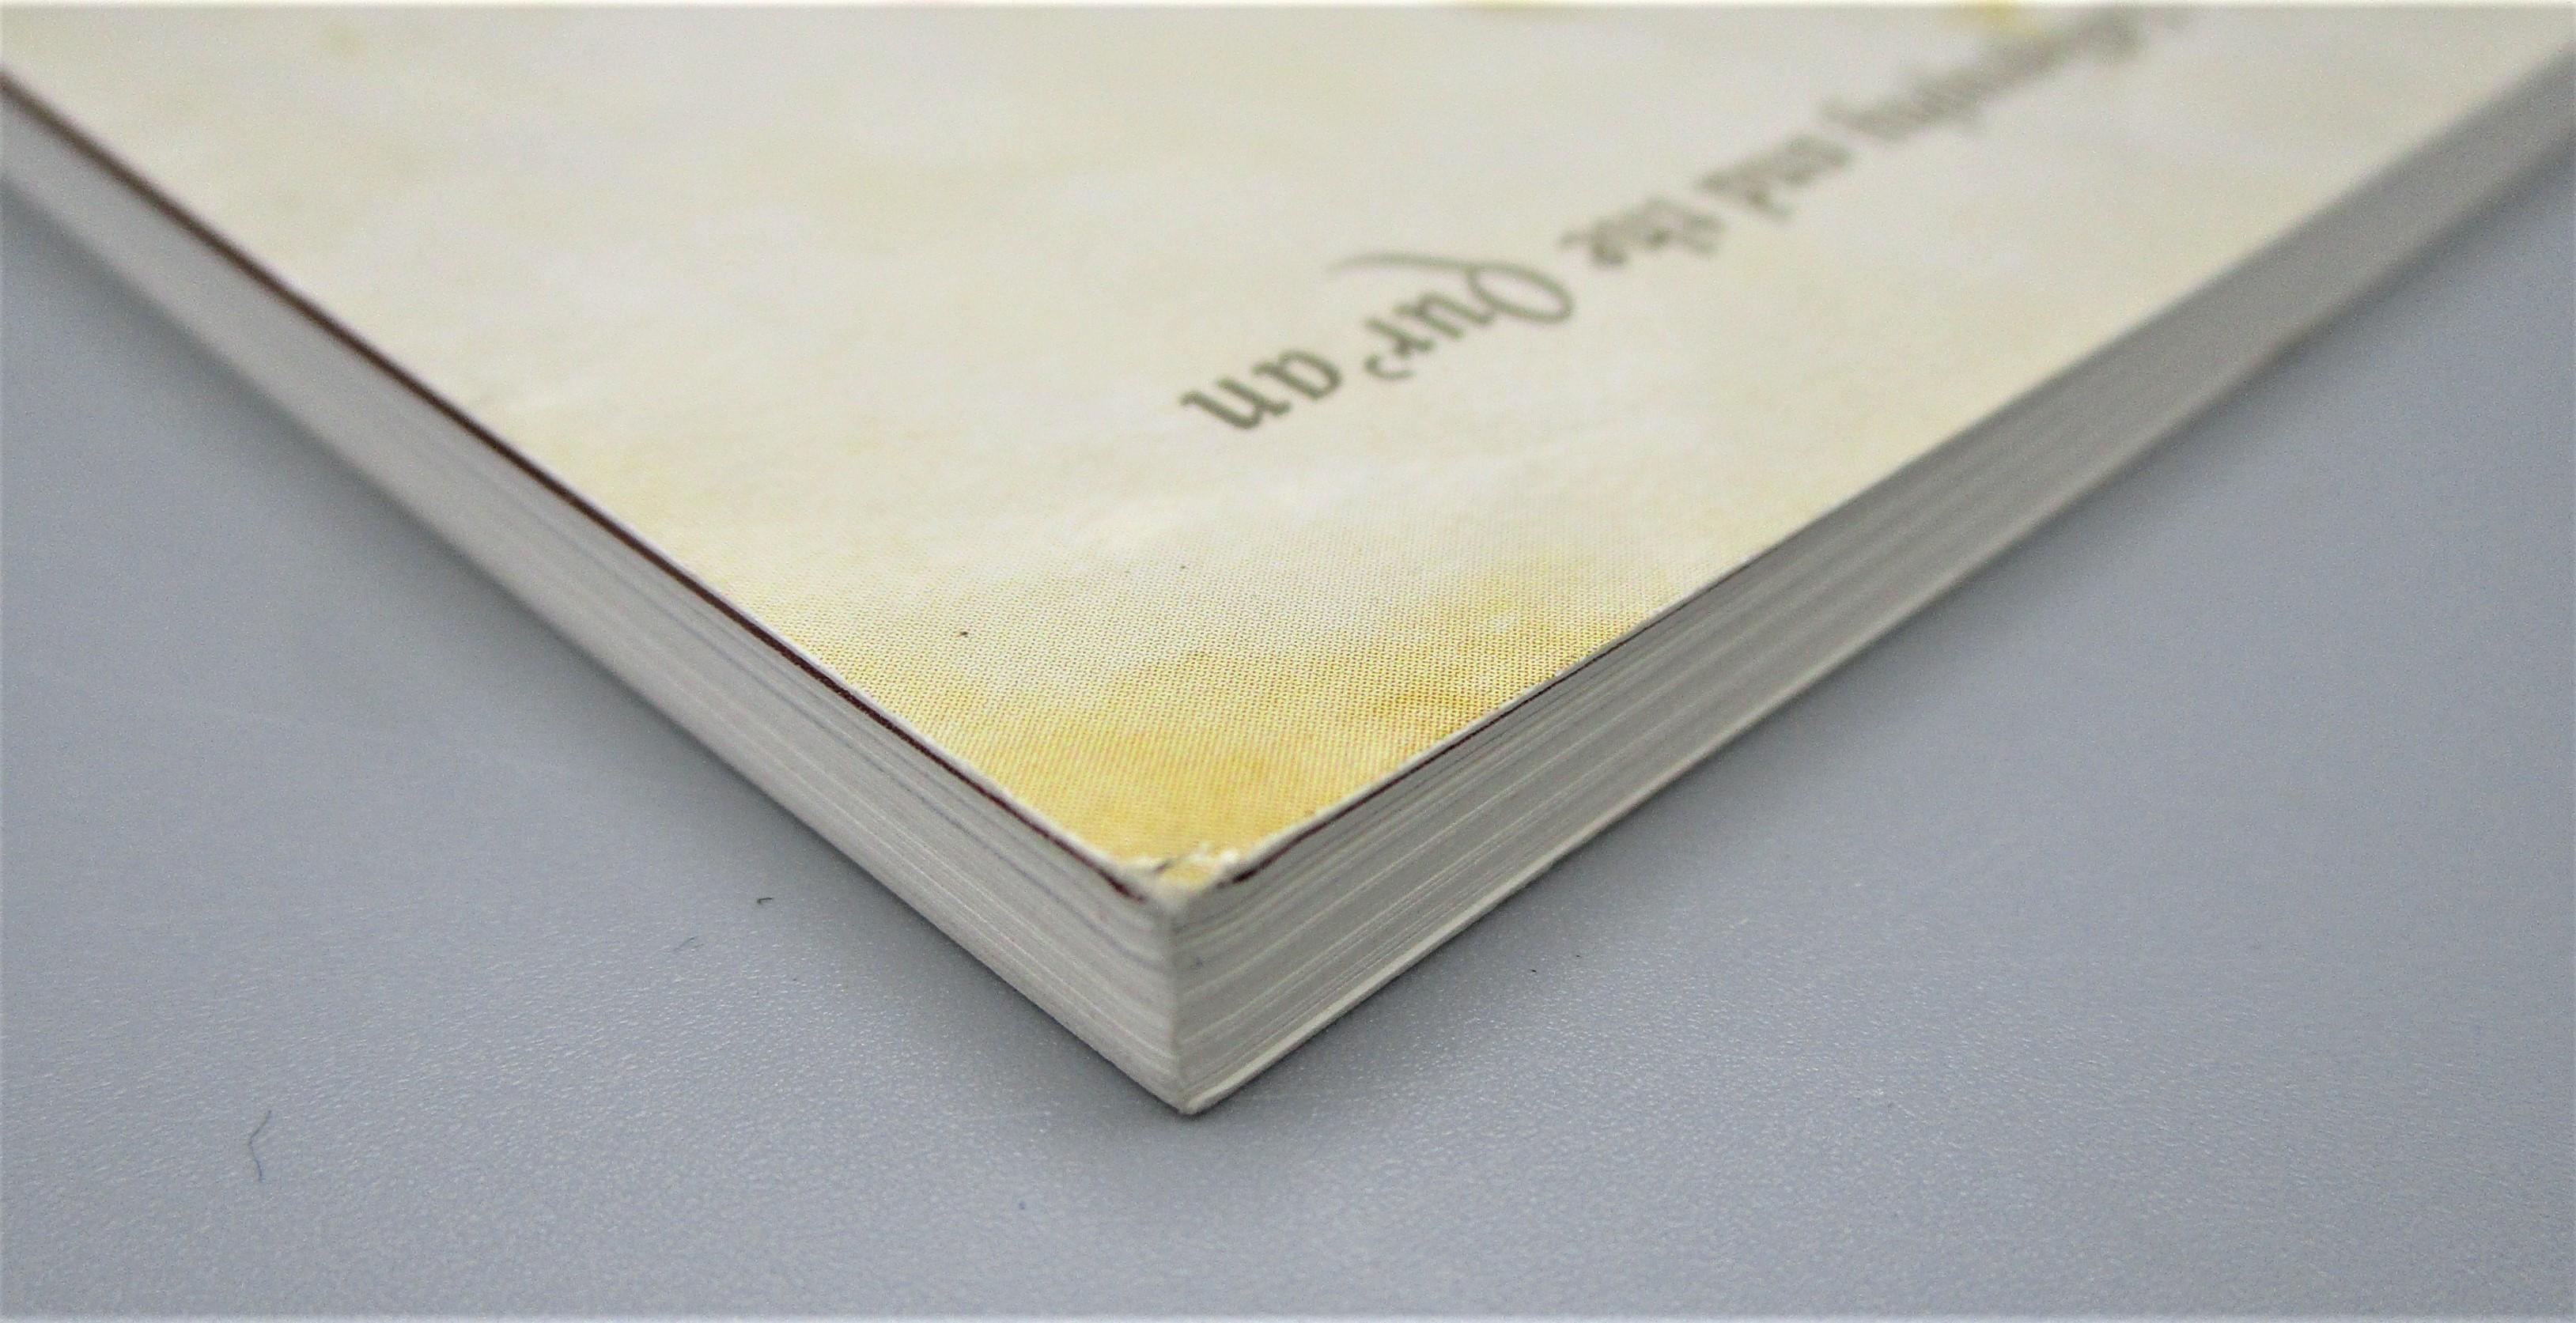 WRITING THE WORD OF GOD, by David J. Roxburgh - 2007